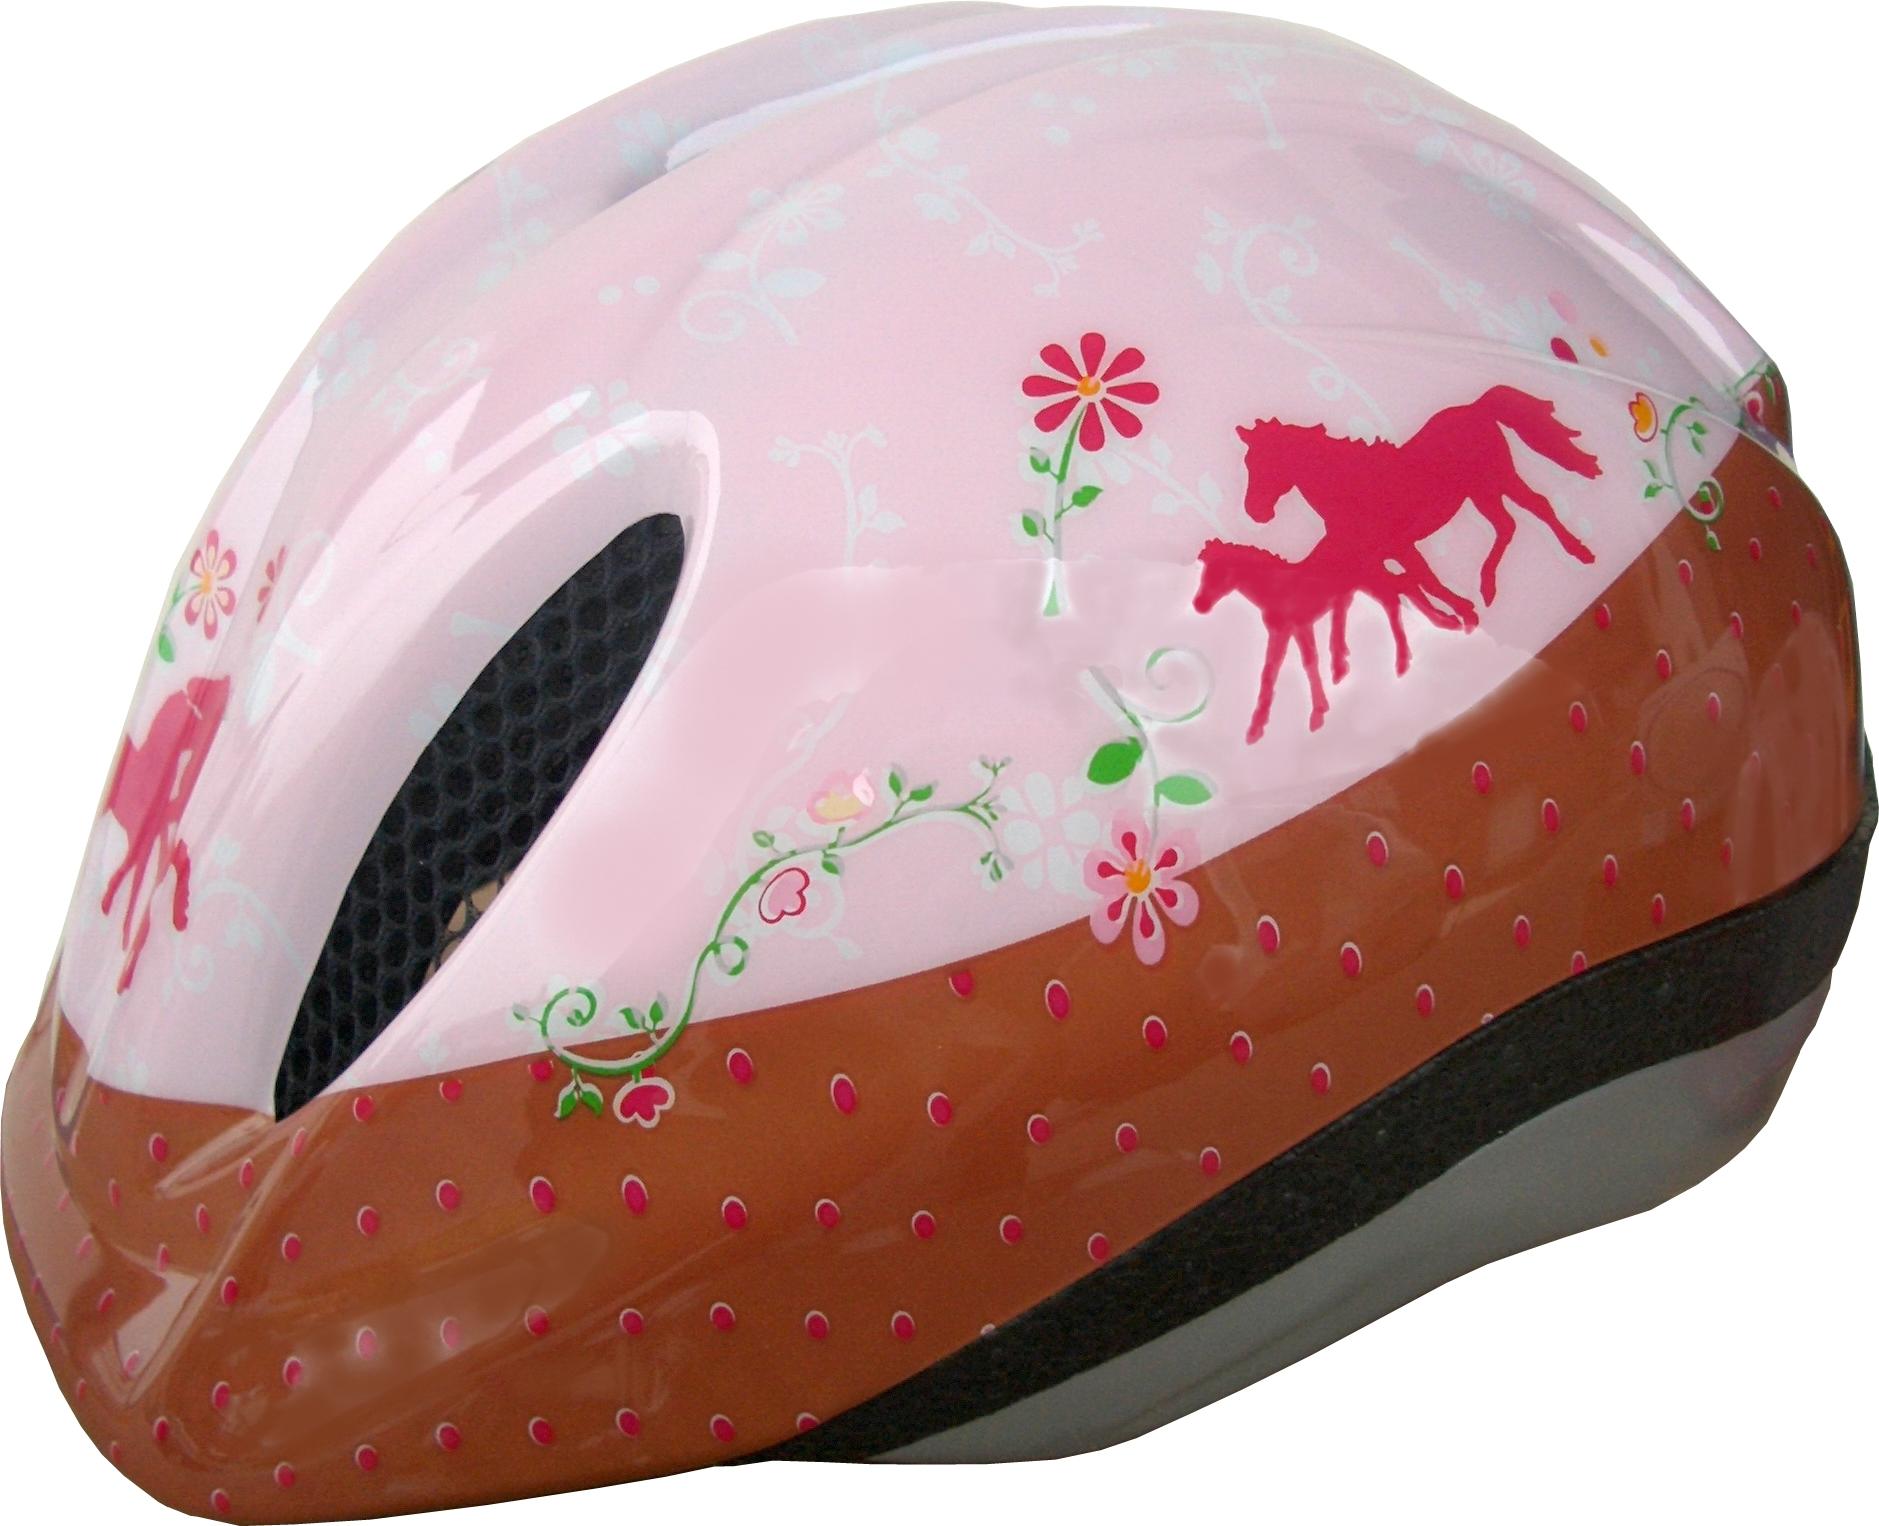 Fahrradhelm Gr. S (46-51 cm) Pferdefreunde (Marke Bike Fashion)